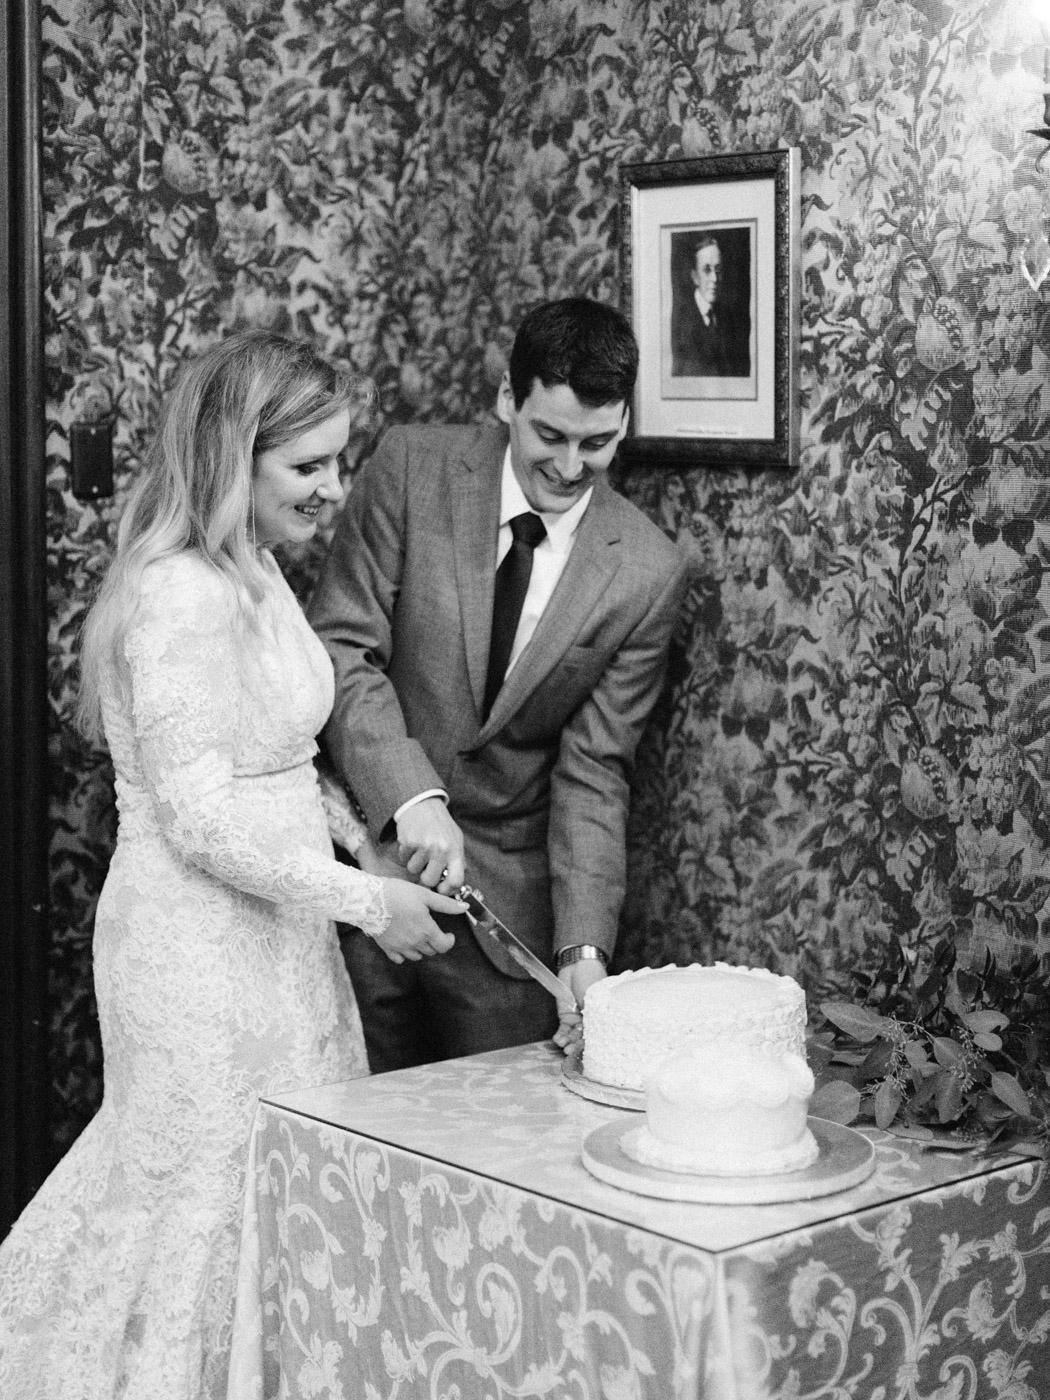 Toronto-wedding-photographer-intimate-classic-fine-art-elopement-ottawa101.jpg